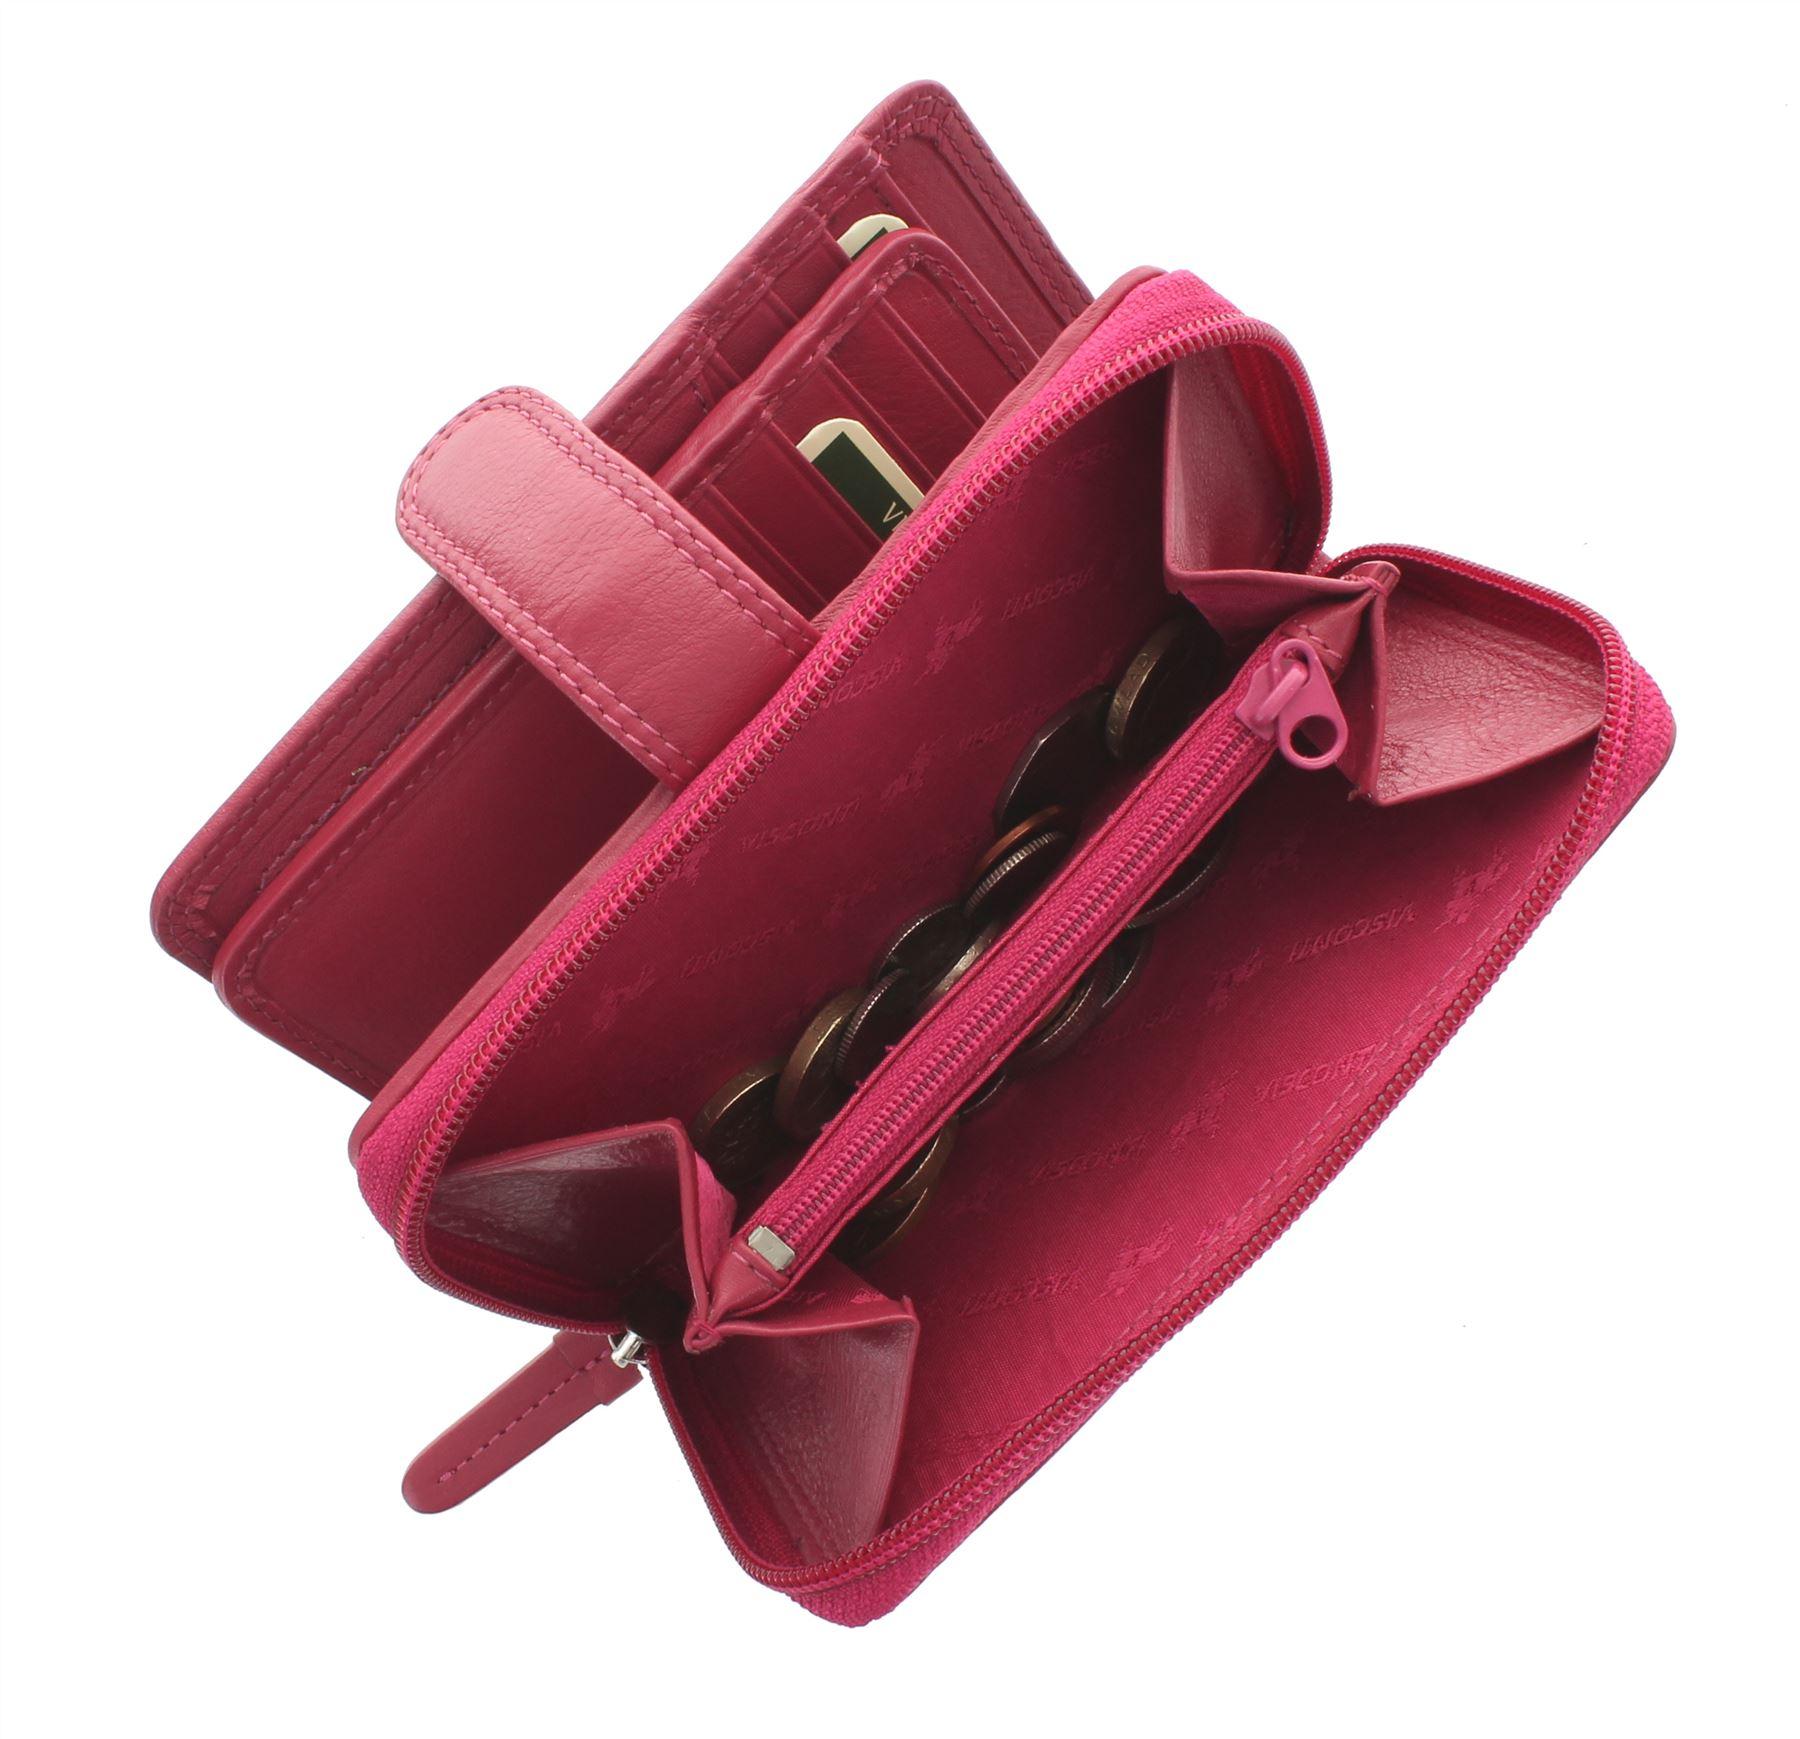 Visconti-Heritage-Collection-MADAME-Leather-Purse-Tab-Closure-RFID-blocking-HT33 miniatura 16